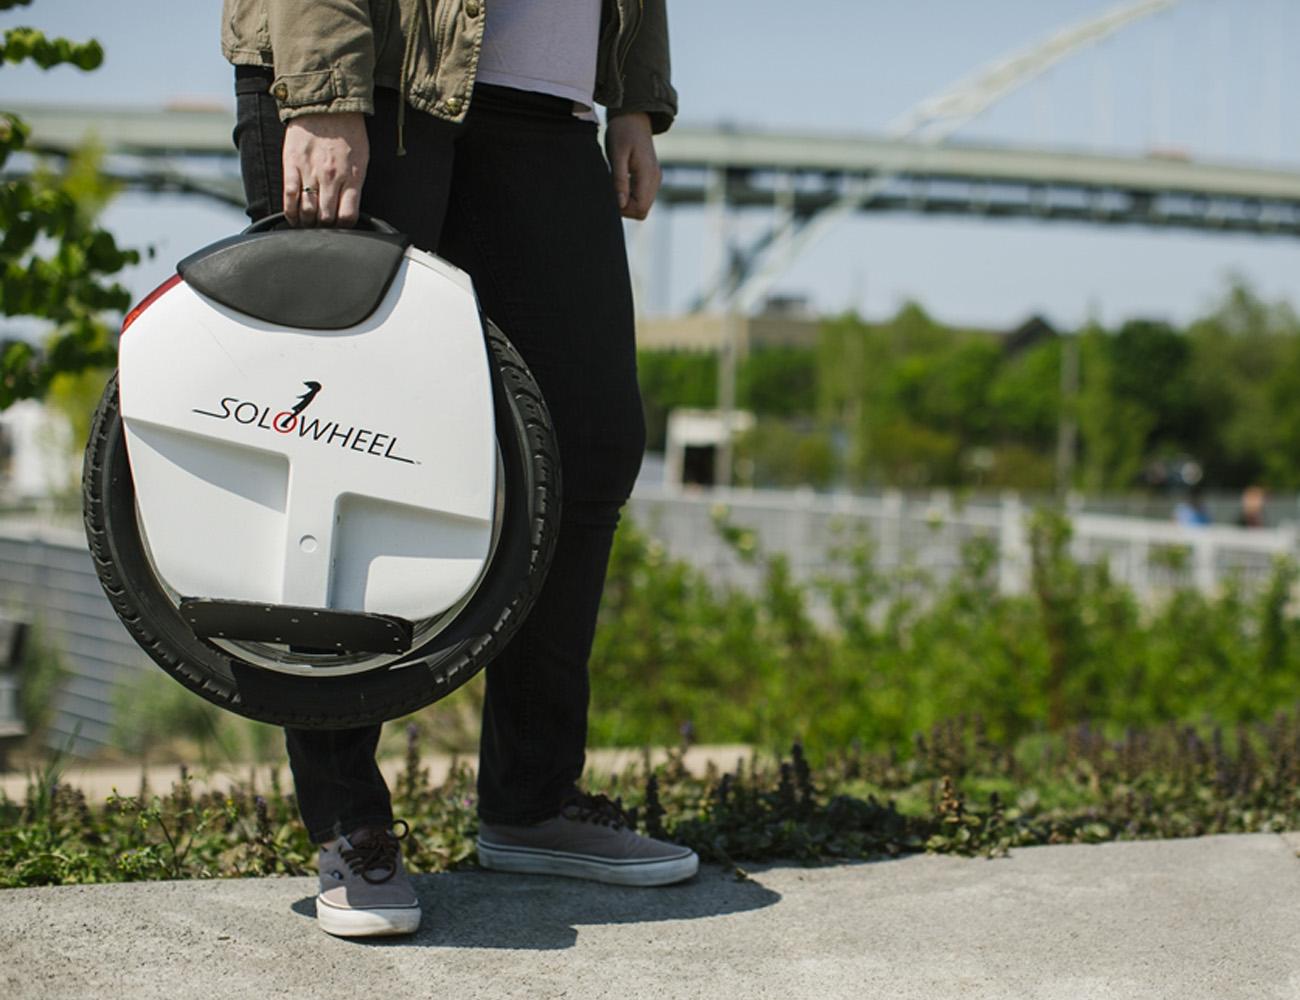 solowheel-xtreme-electric-unicycle-02